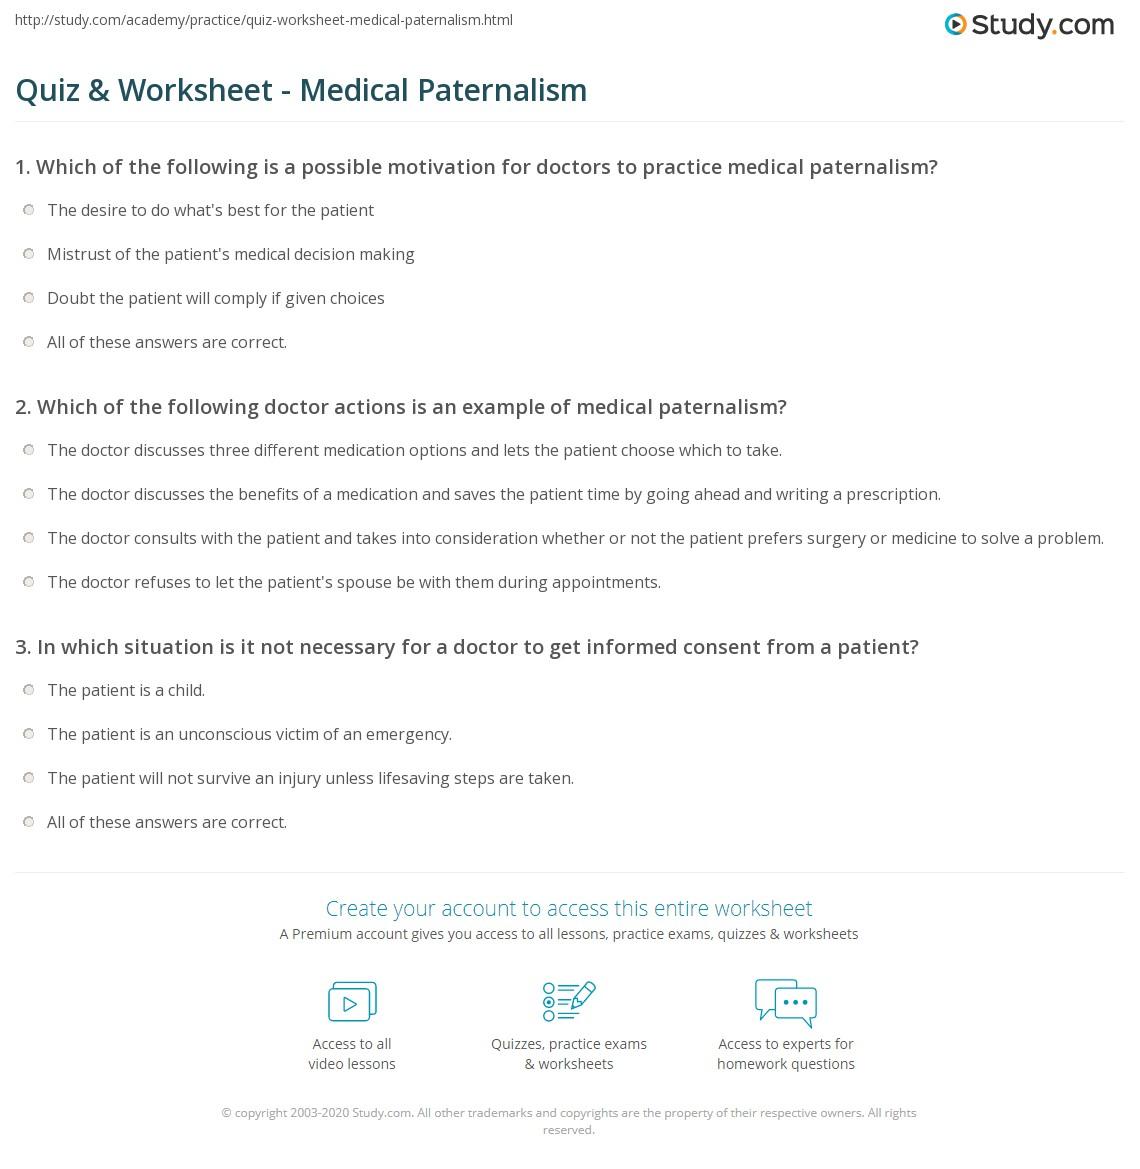 Quiz & Worksheet - Medical Paternalism   Study.com